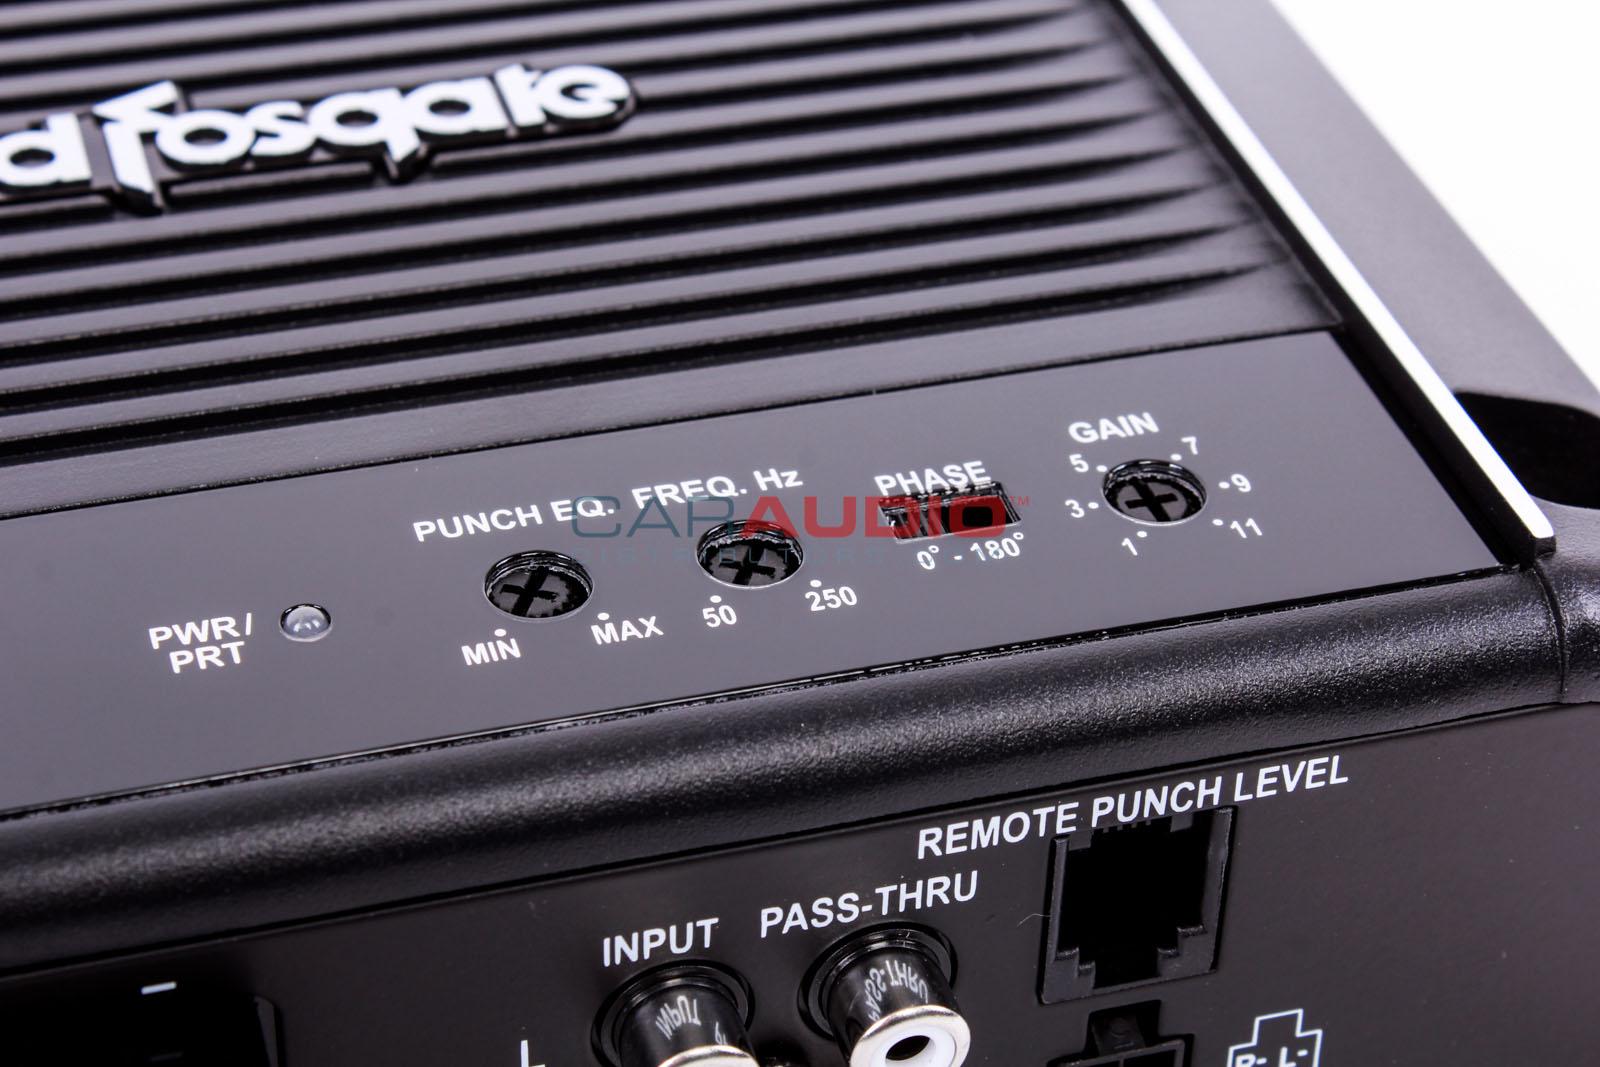 New Rockford Fosgate R500x1d Prime Series 500w Rms